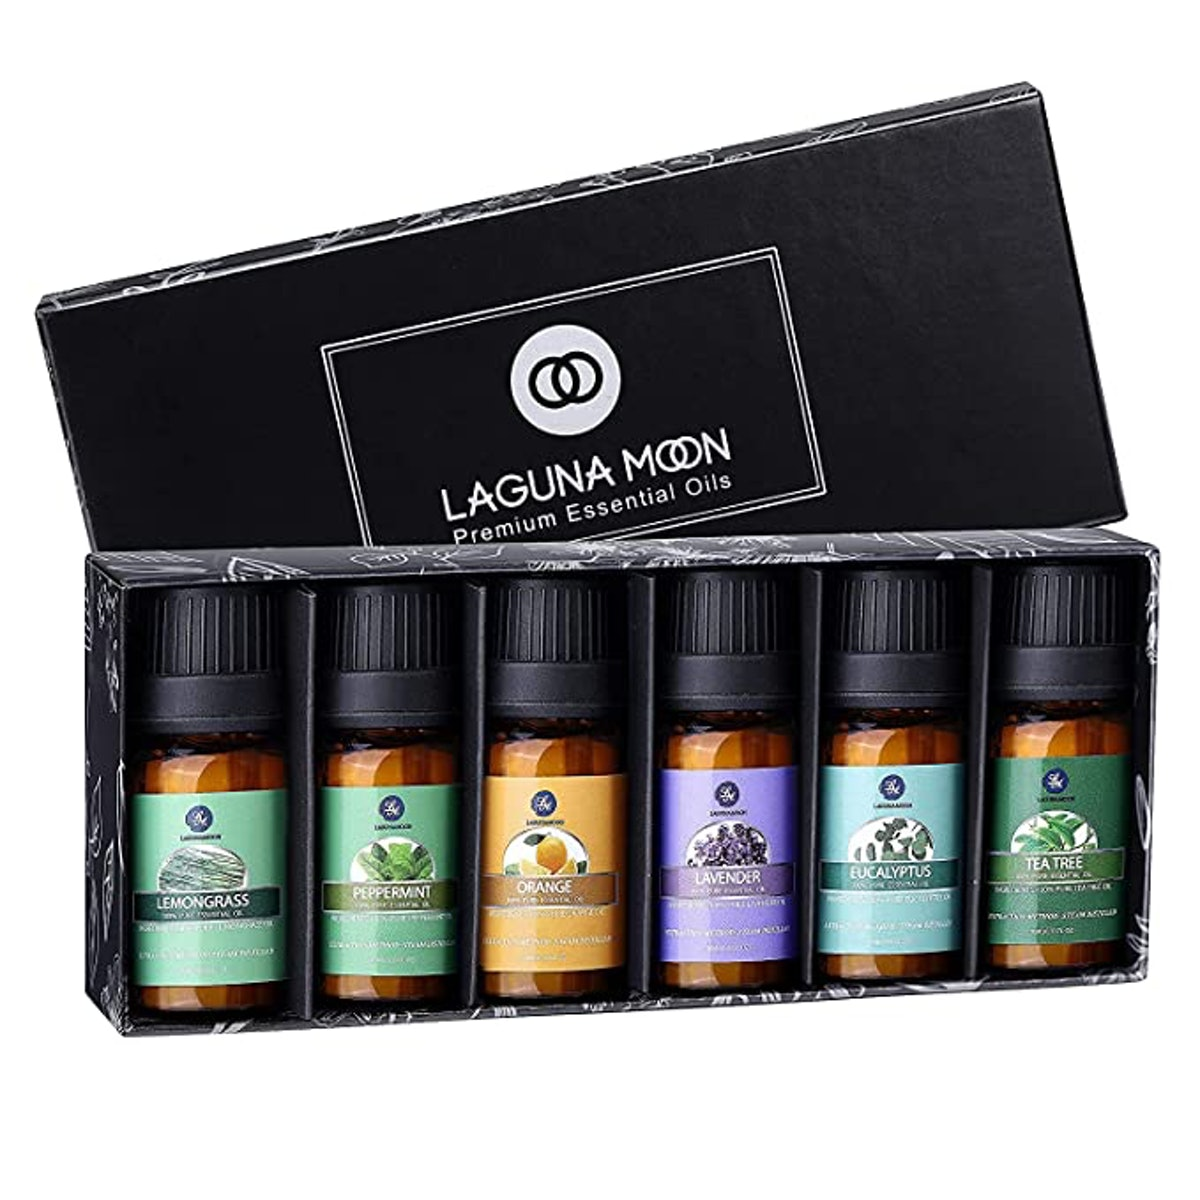 Lagunamoon Essential Oils Gift Set (6-Piece)